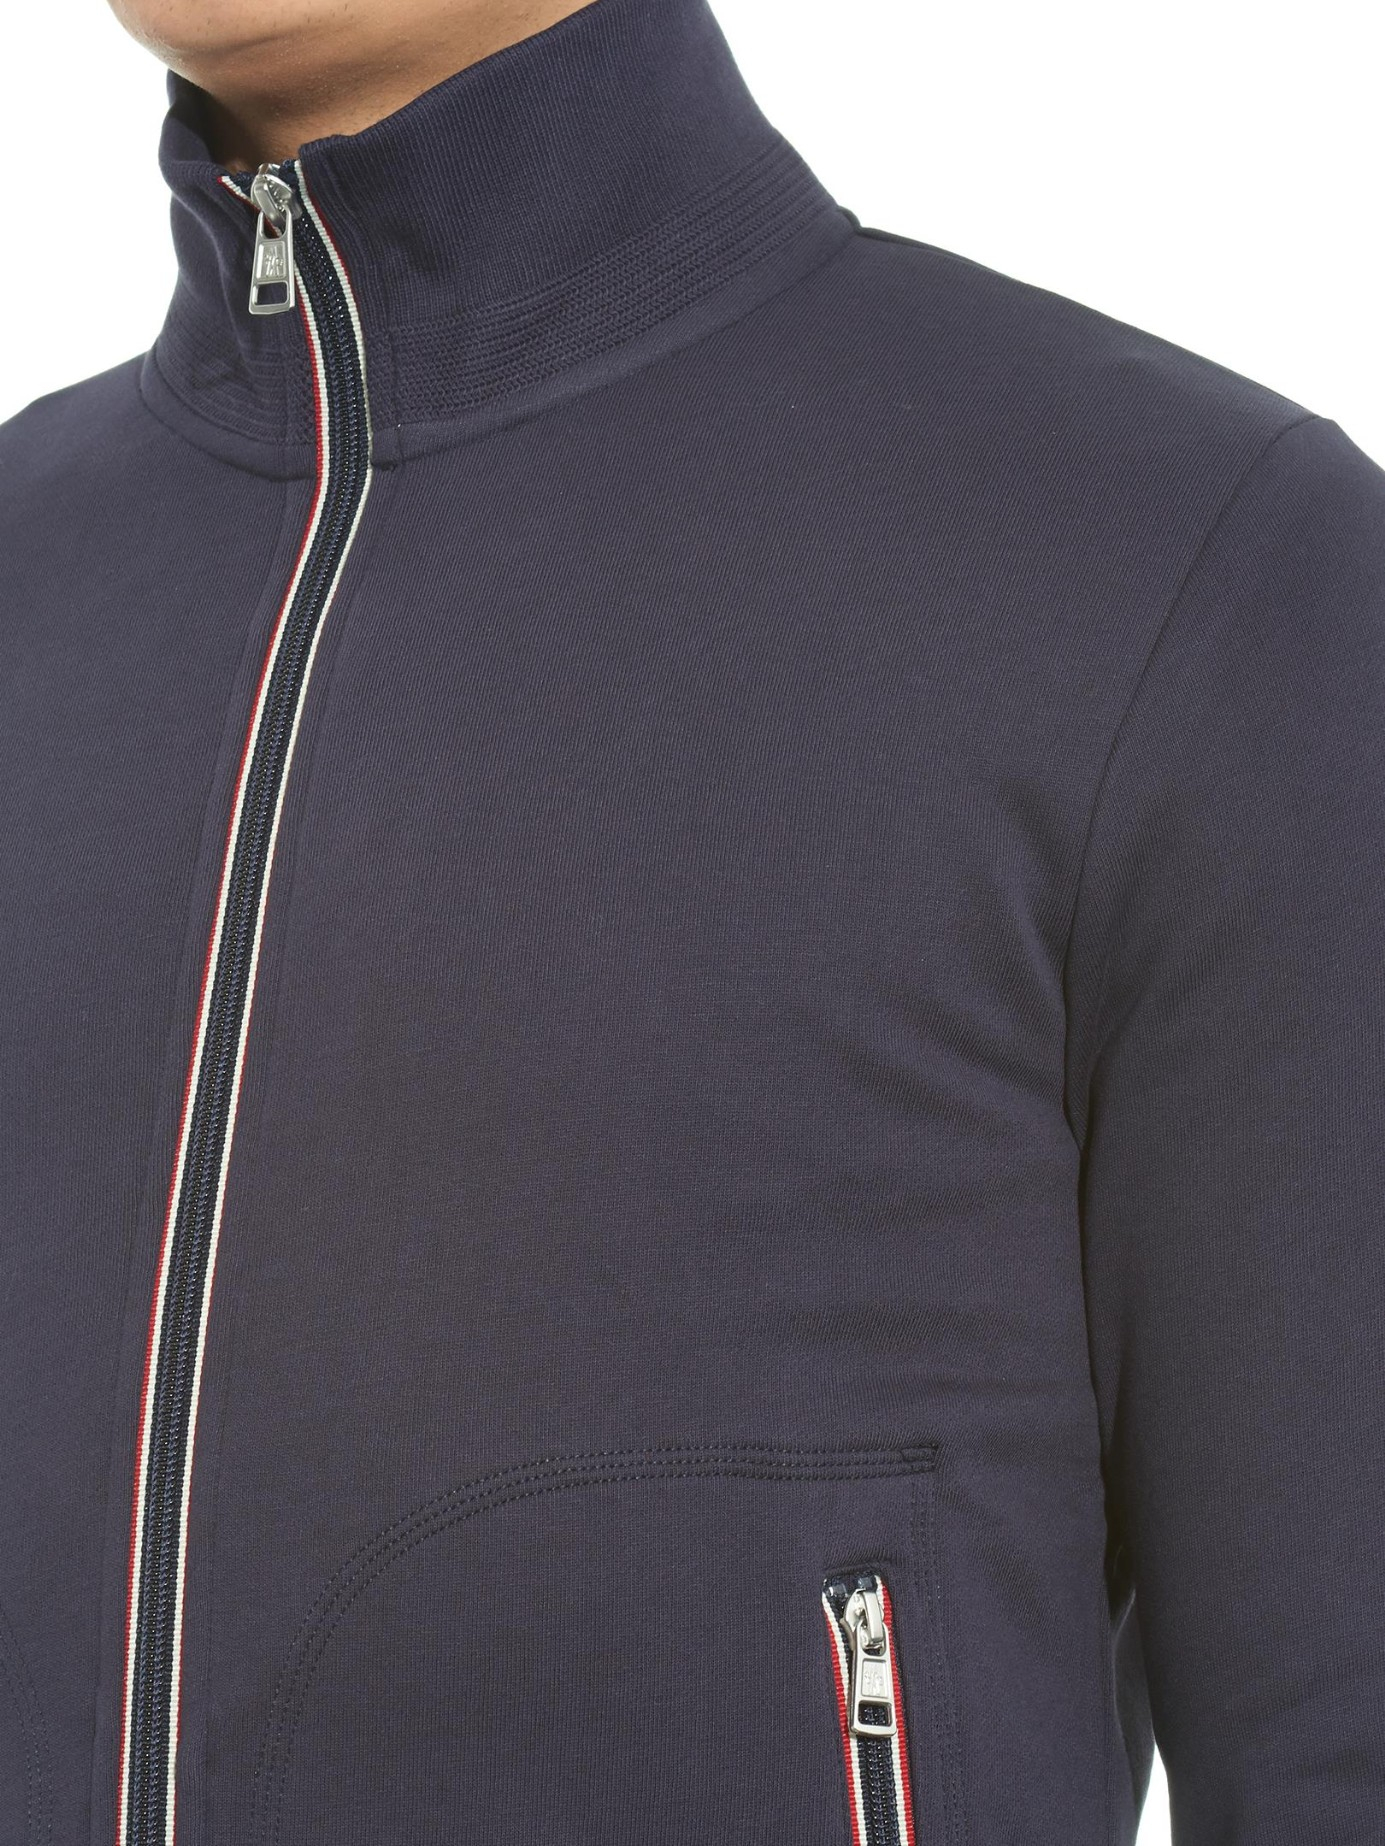 moncler sweatshirt blue